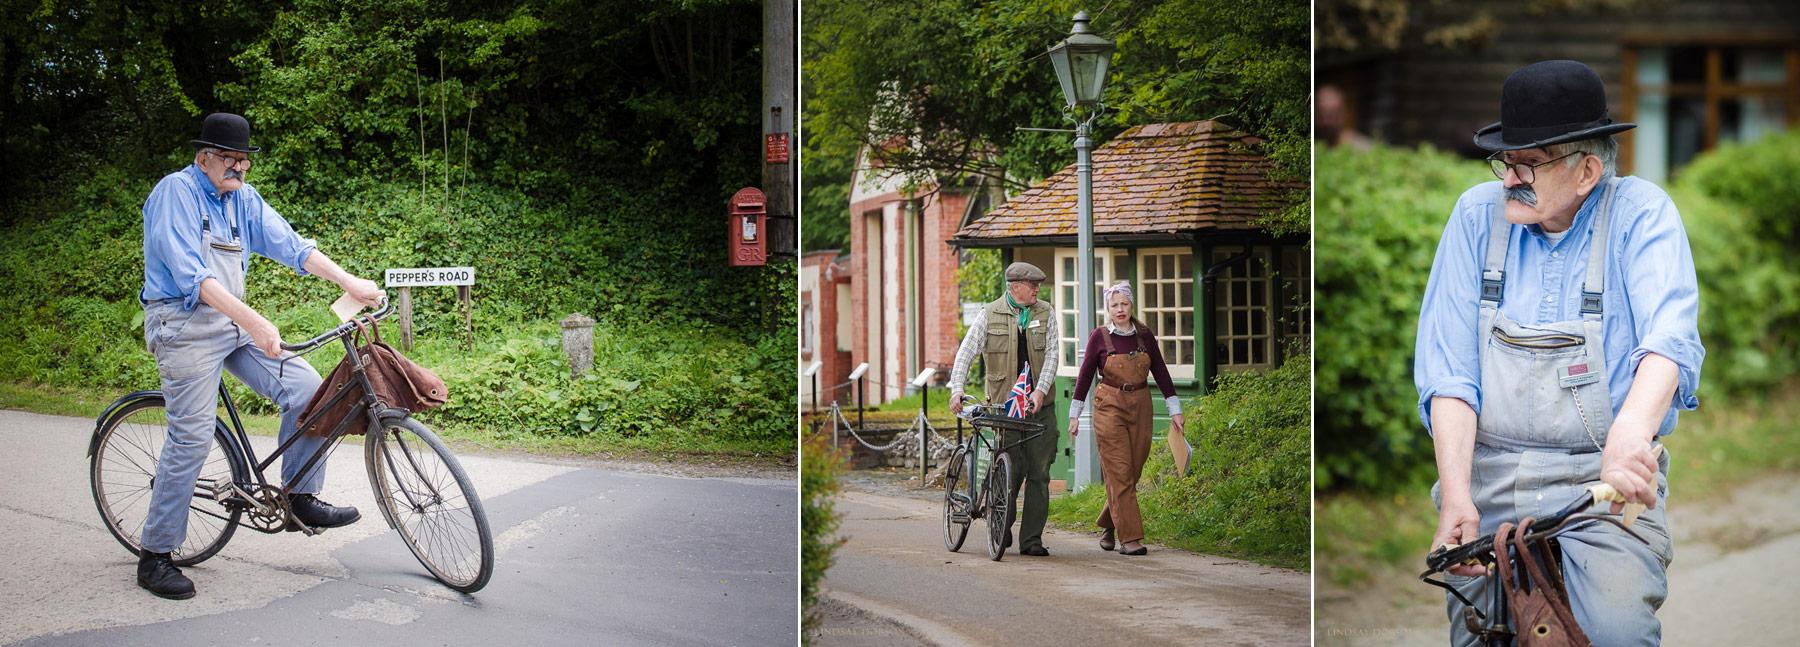 amberley-chalkpits-museum-portraits.jpg